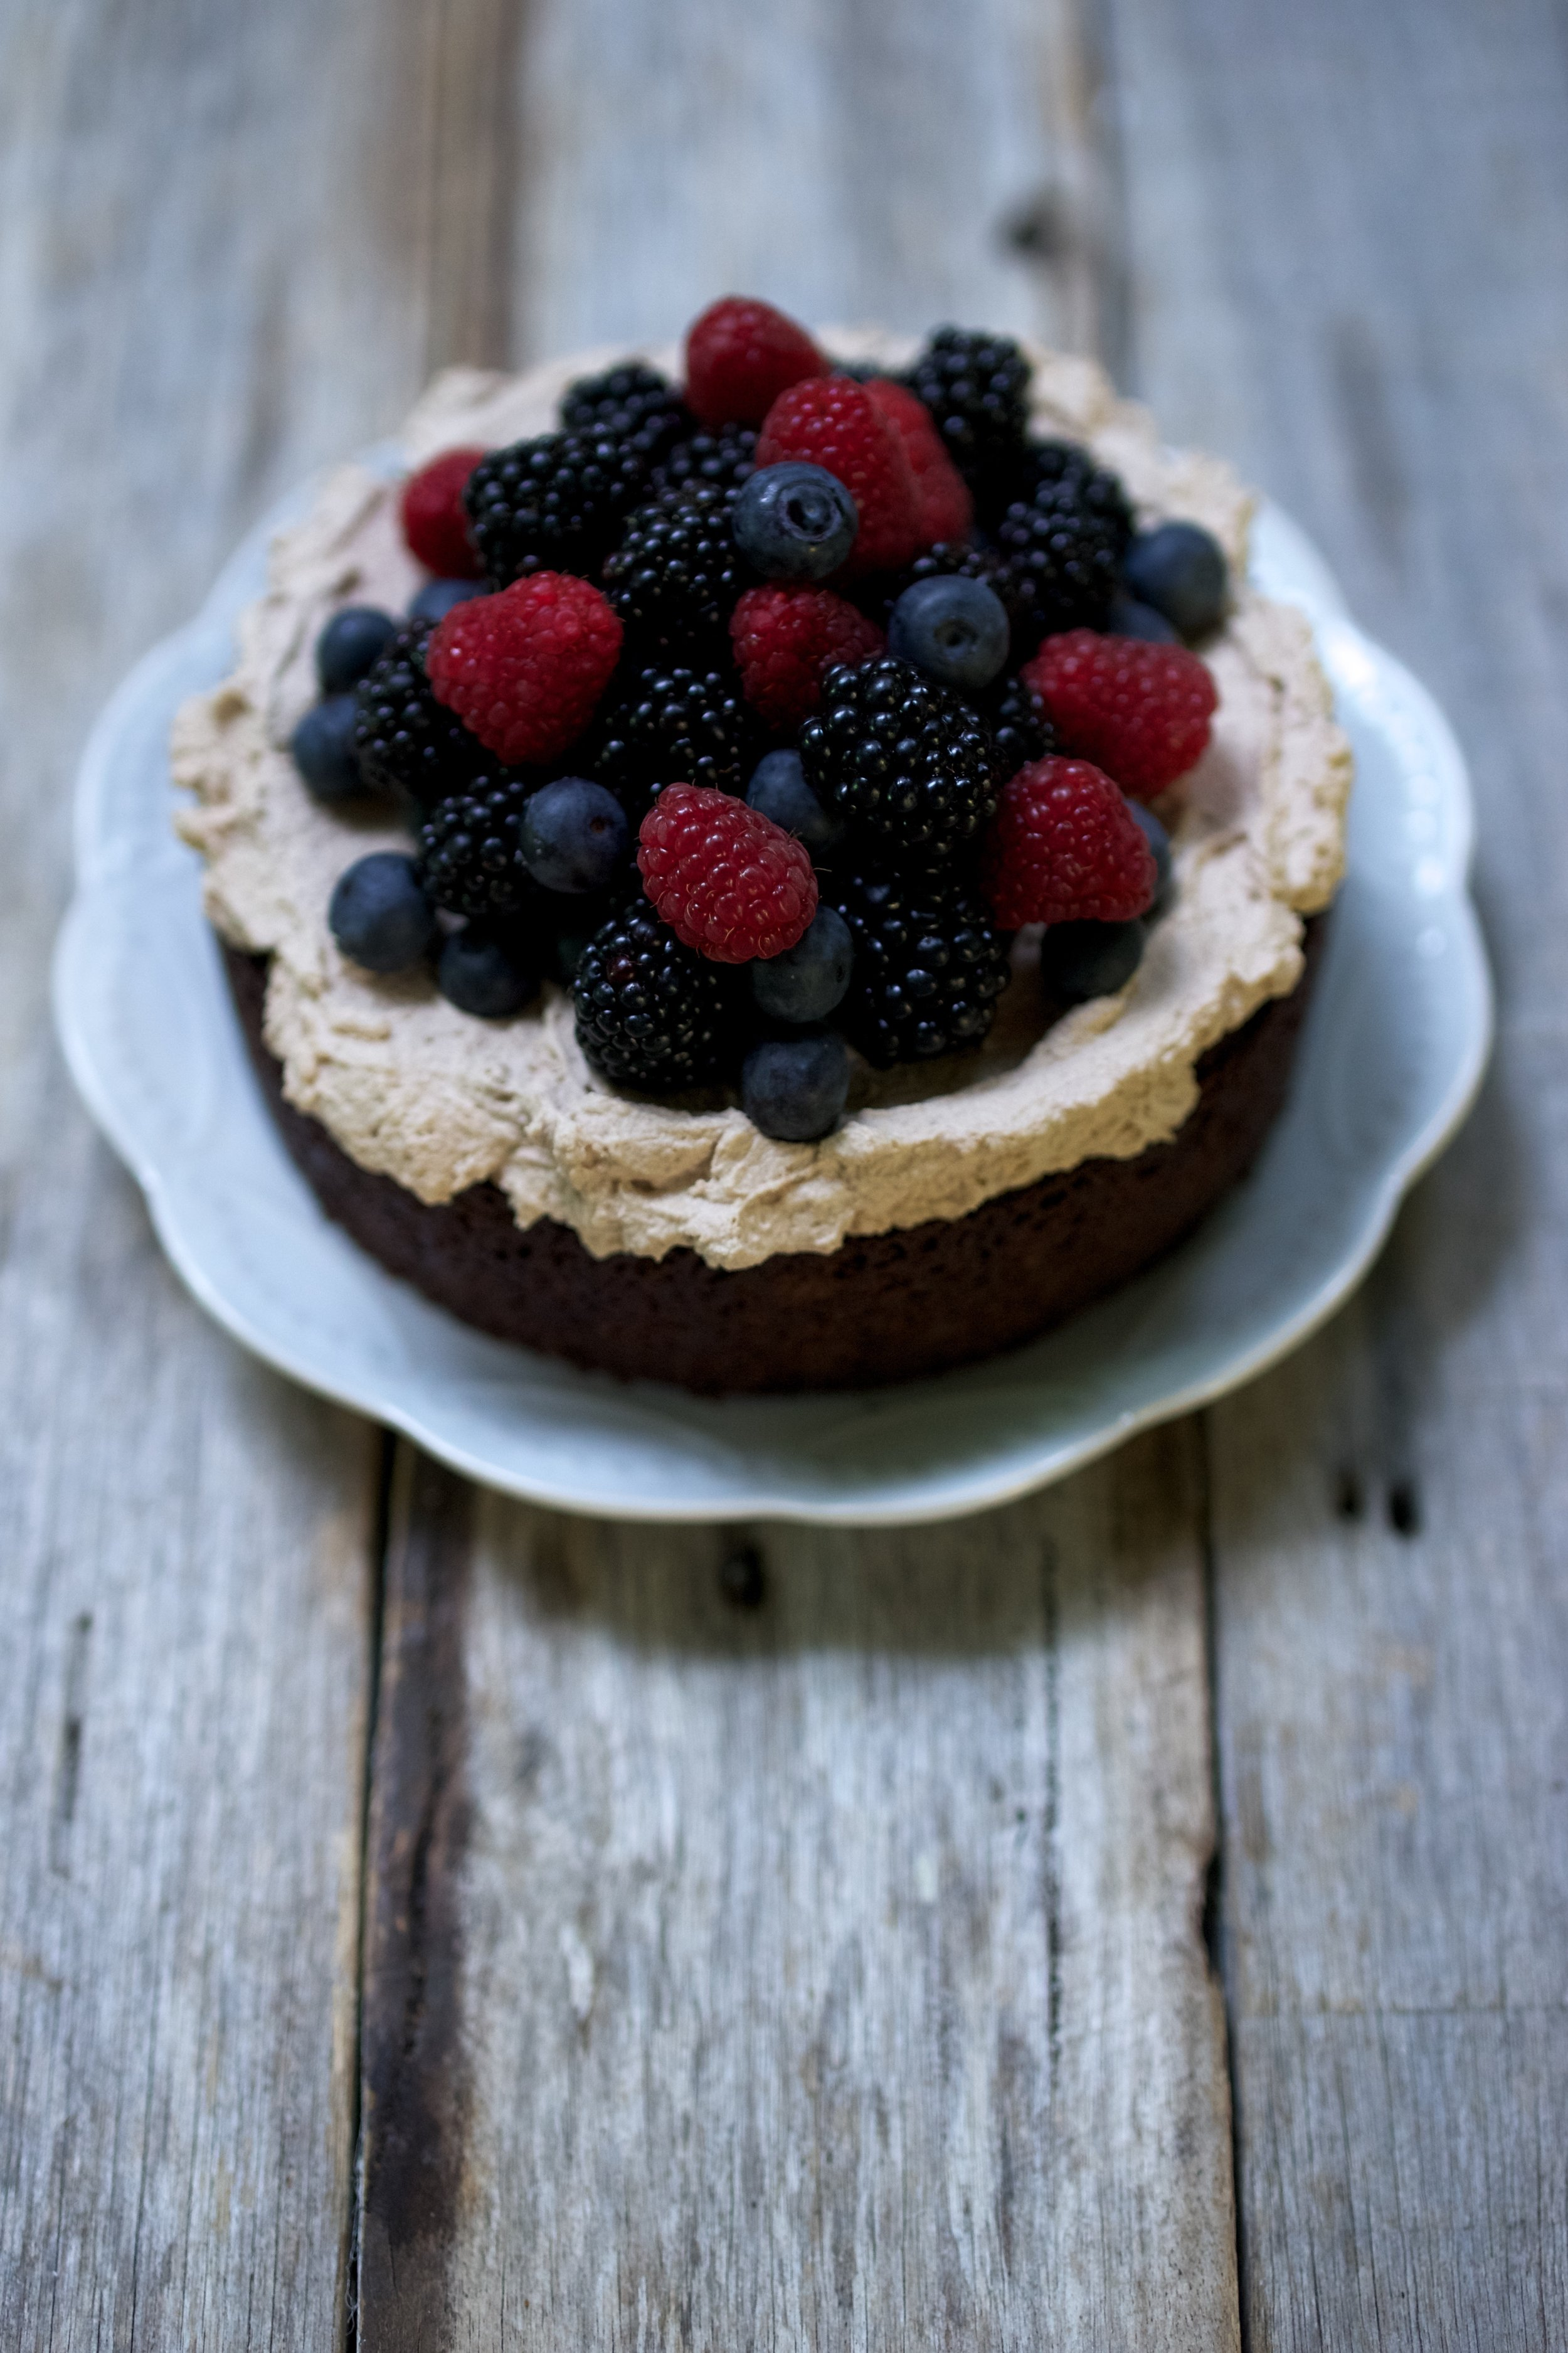 Mud Cake with Mocha Cream and Berries